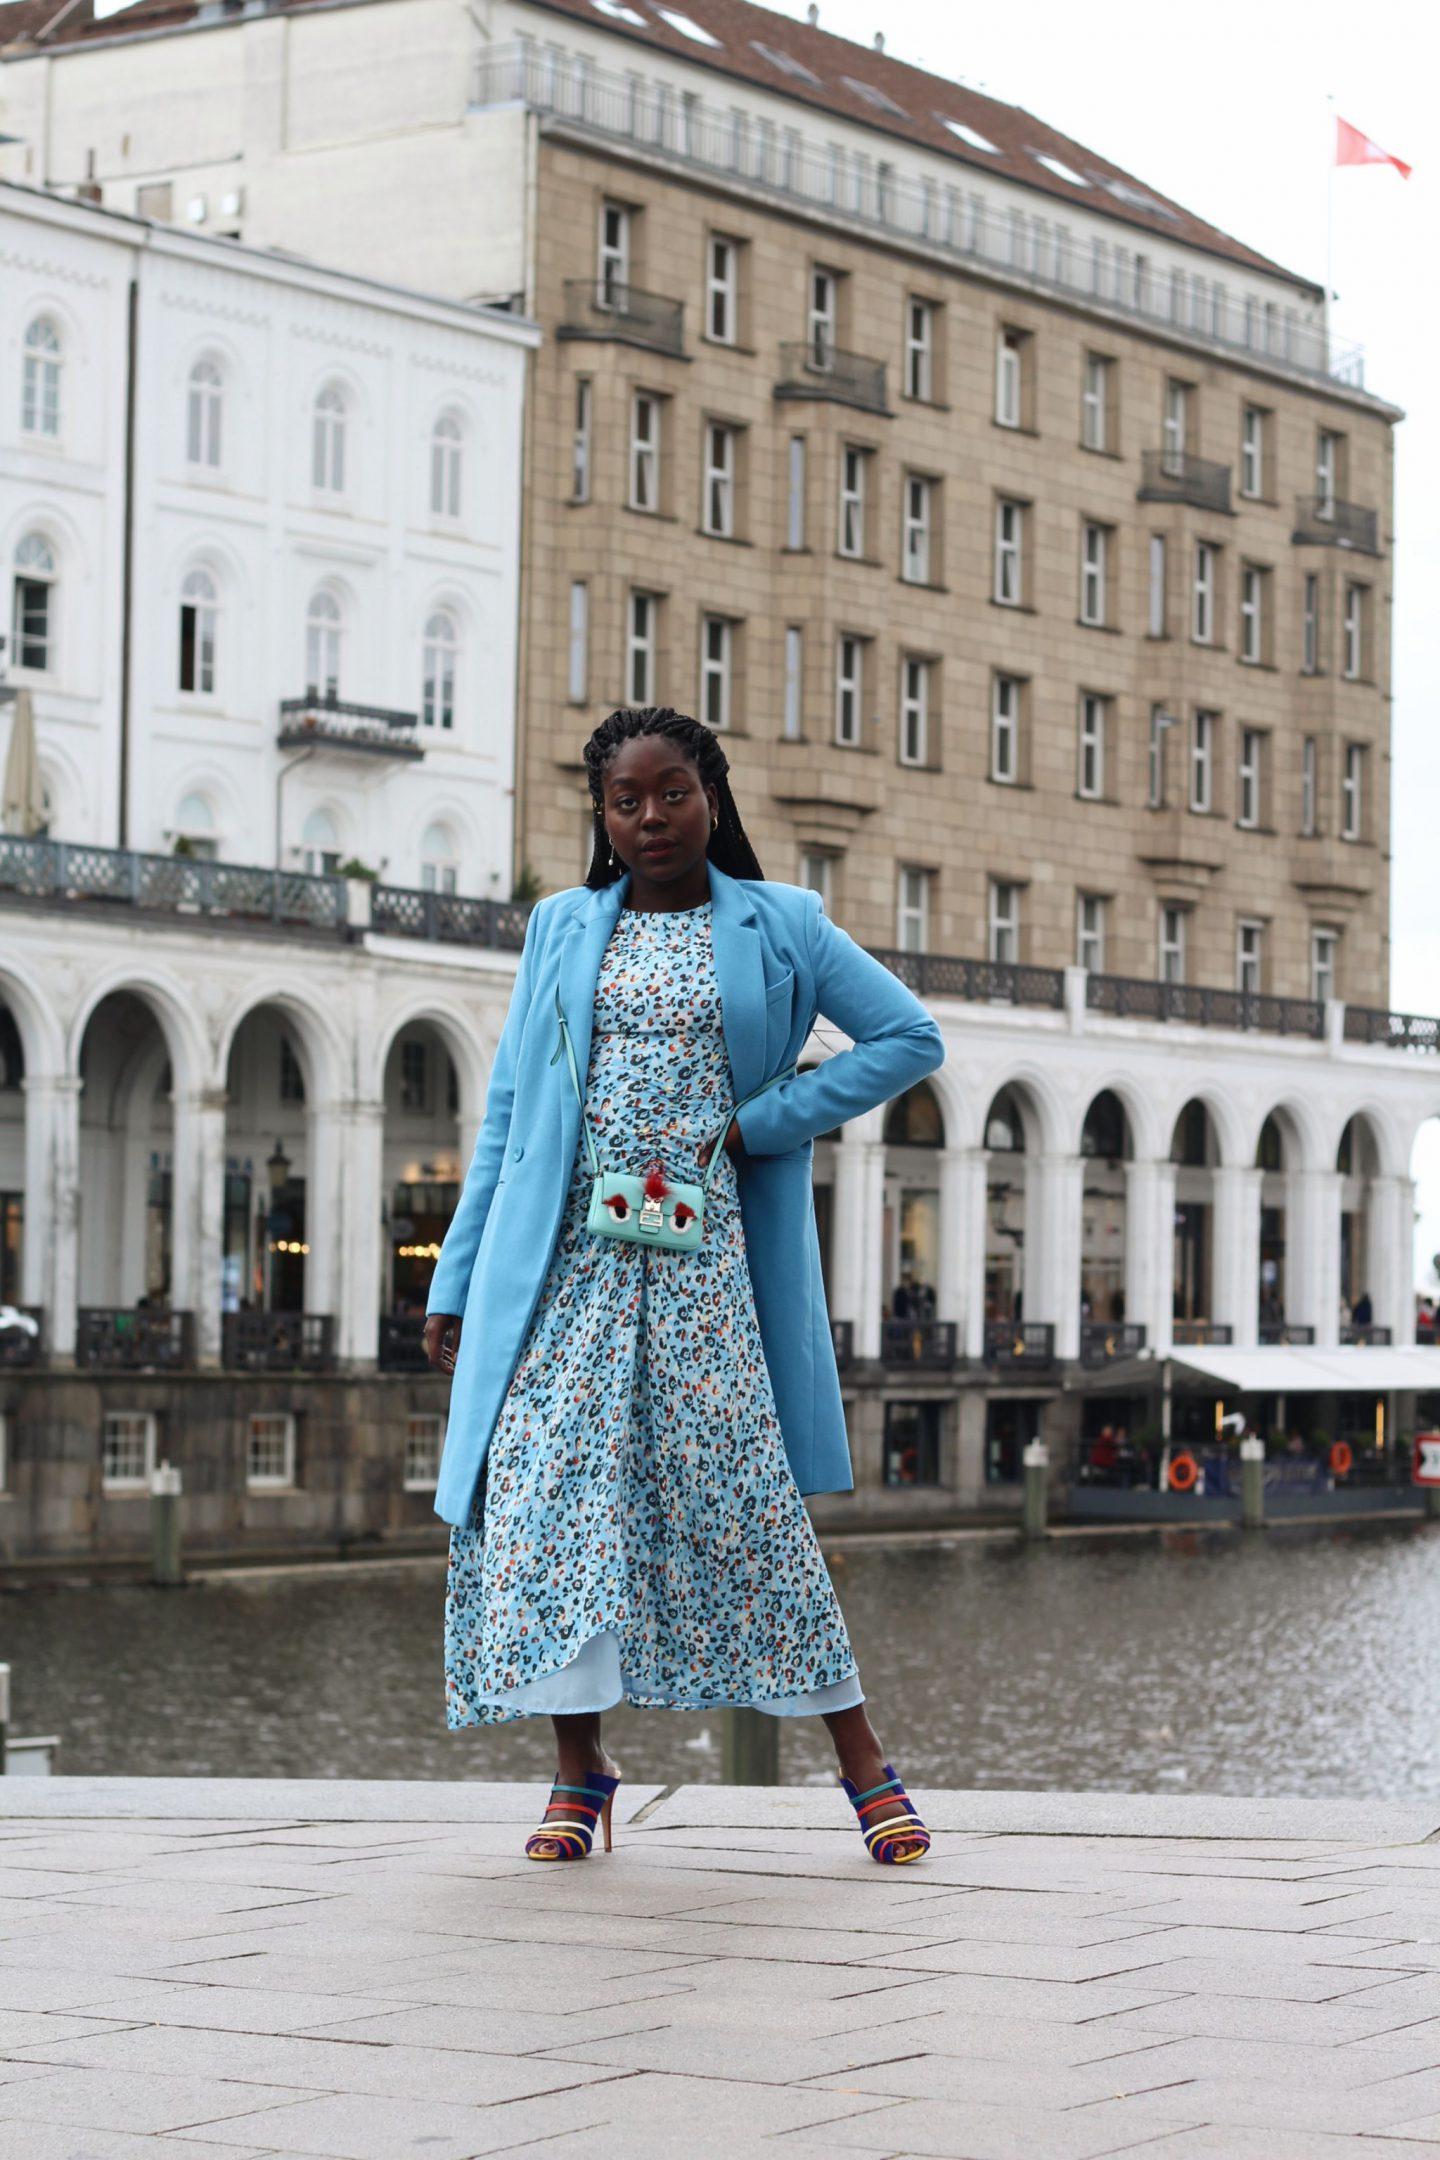 Lala_Berlin_Streetstyle_Lois_Opoku_Fashion_Blogger_Fendi_Monster_Malone_Souliers_lisforlois_5